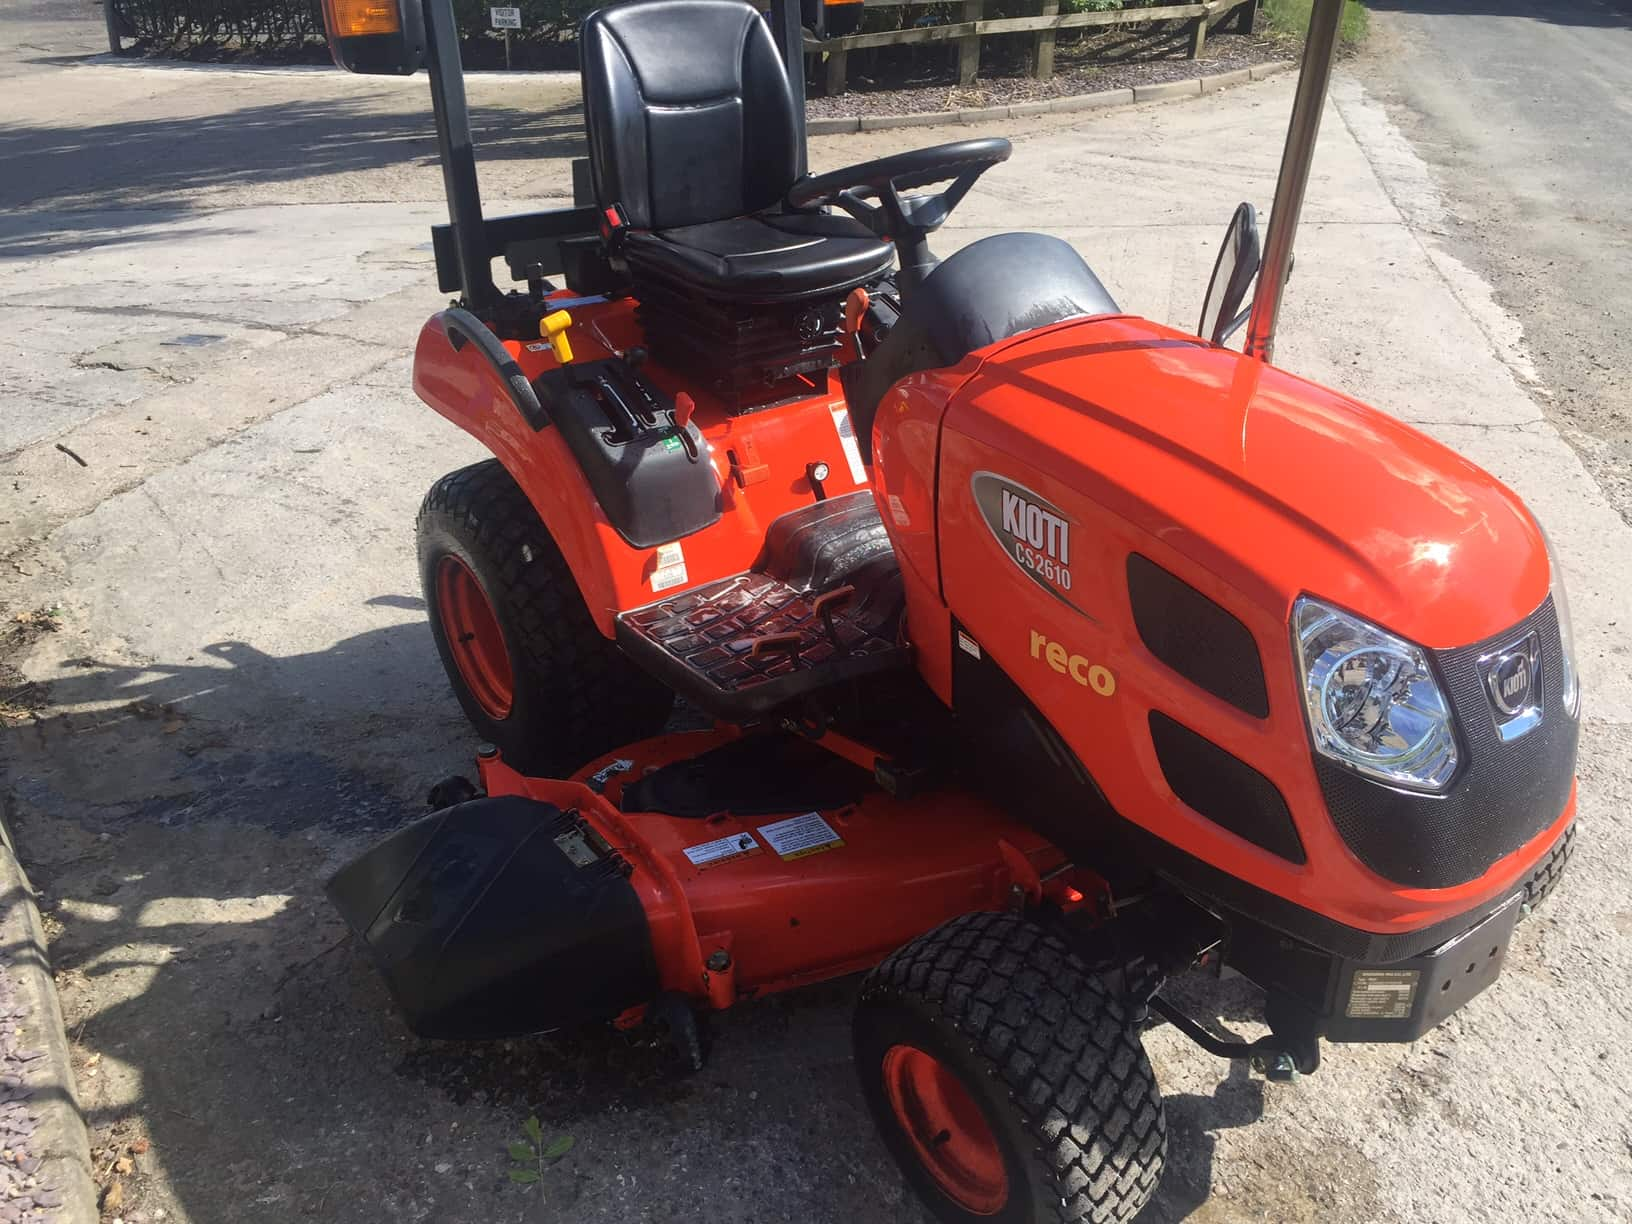 Kioti Tractors 2610 : Kioti cs u campey turf care systems